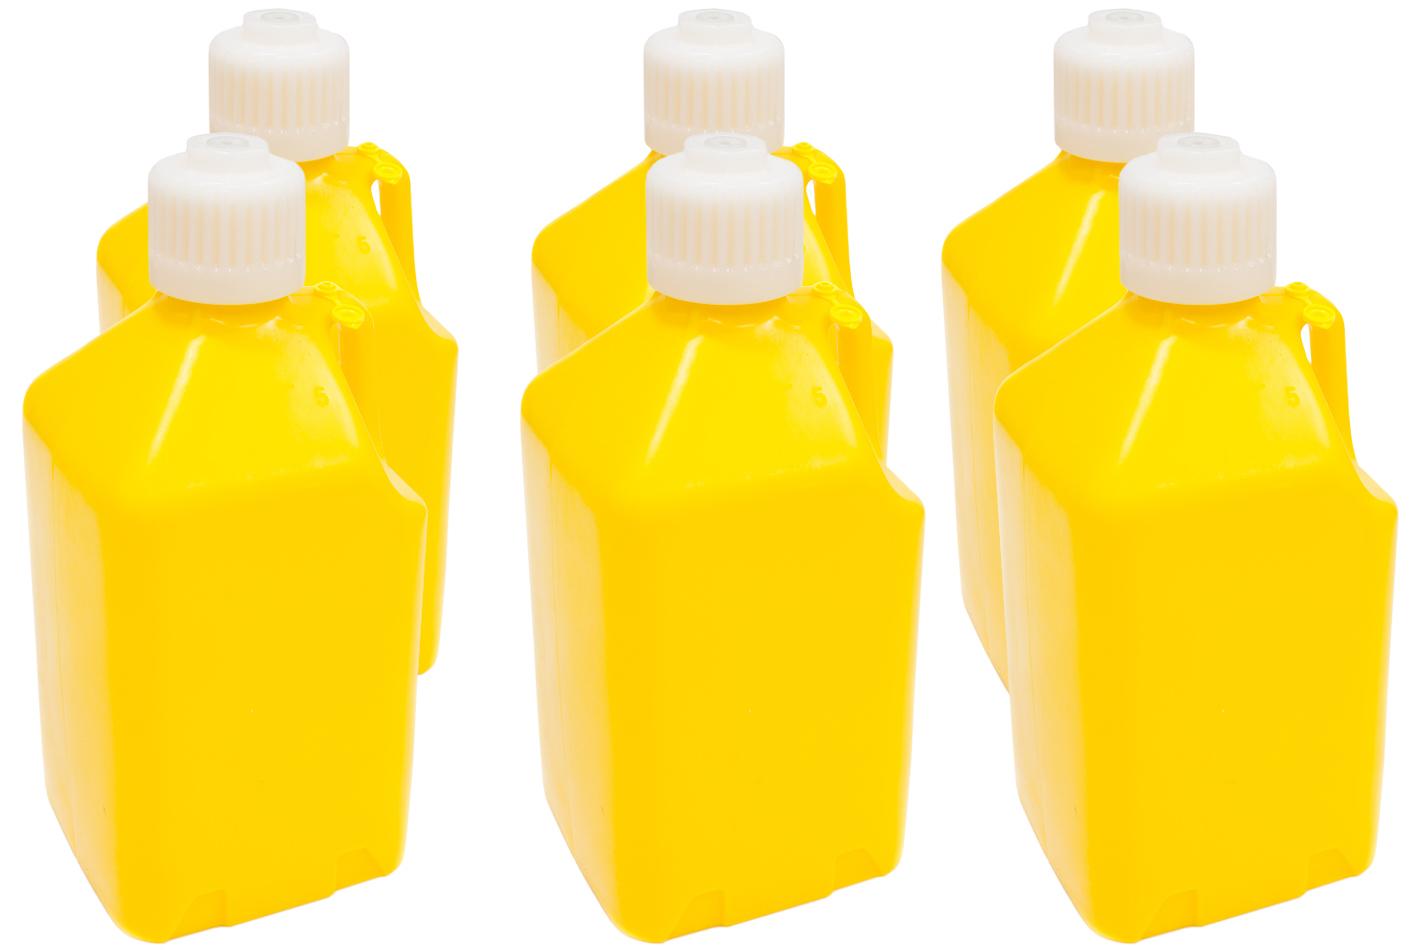 Scribner Utility Jug - 5-Gallon Yellow - Case 6